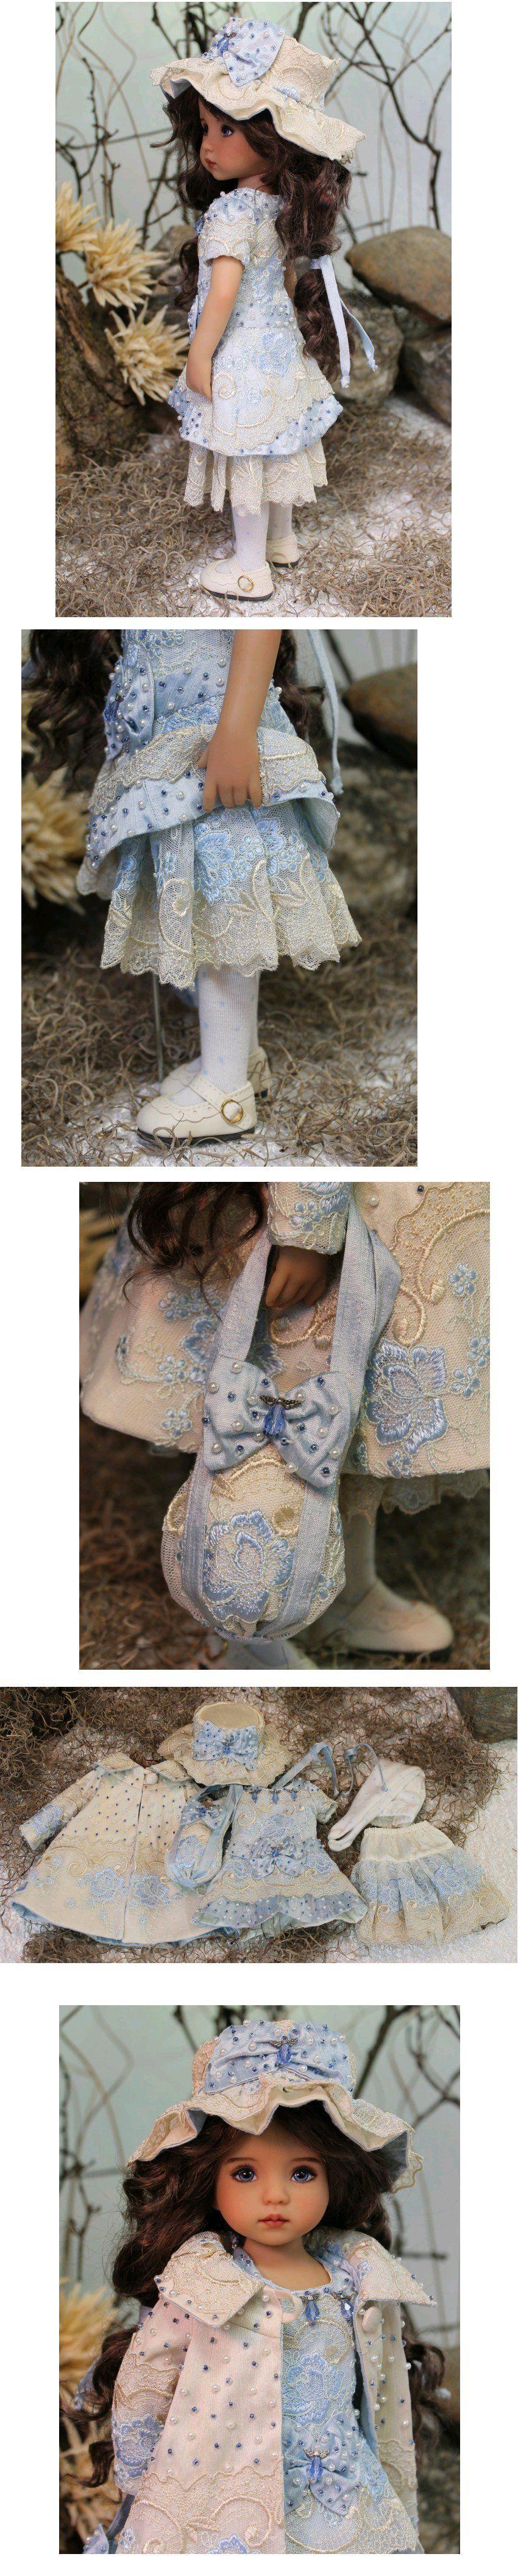 """'Perles Et Dentelles' - a Limited Edition Design for Dianna Effner's Little Darlings"""